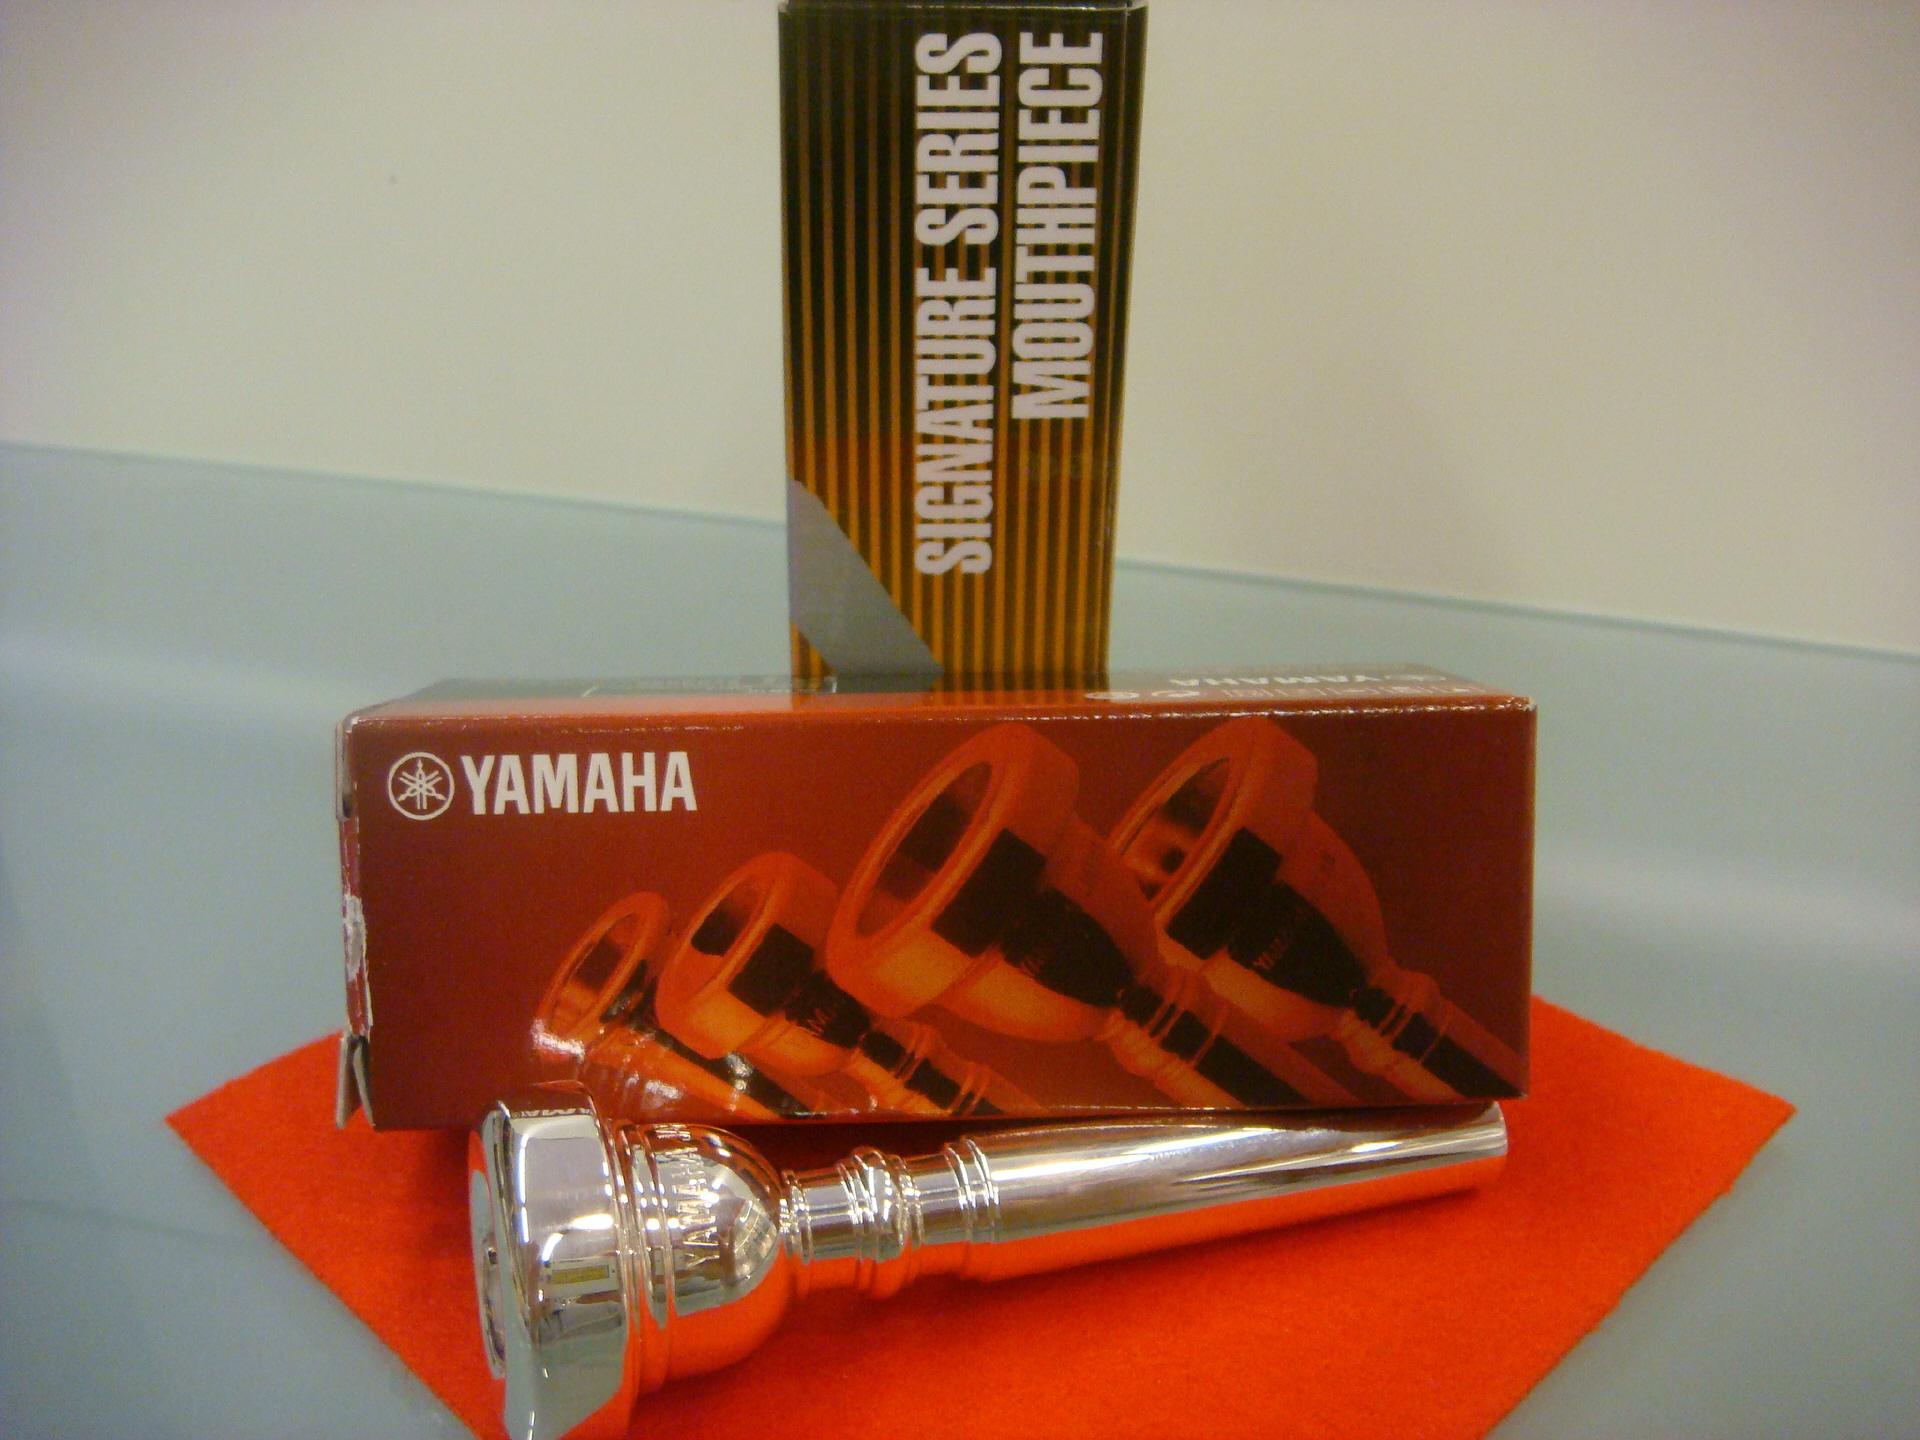 Mundstück Trompete Bobby Shew Lead / Yamaha